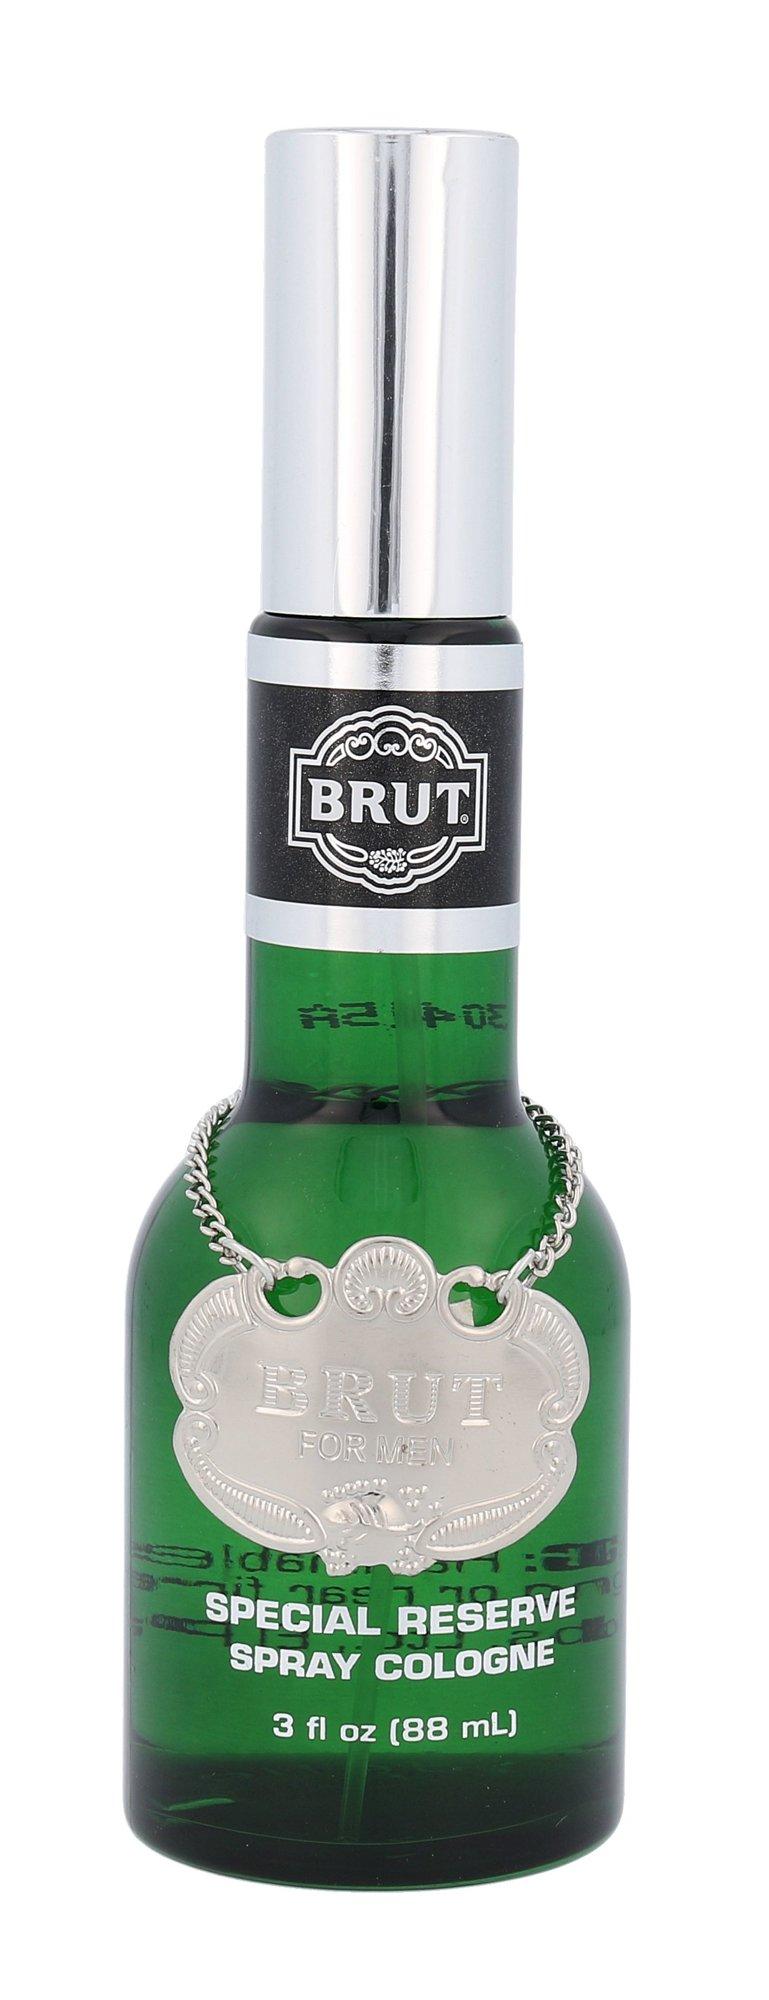 Brut Classic Special Reserve